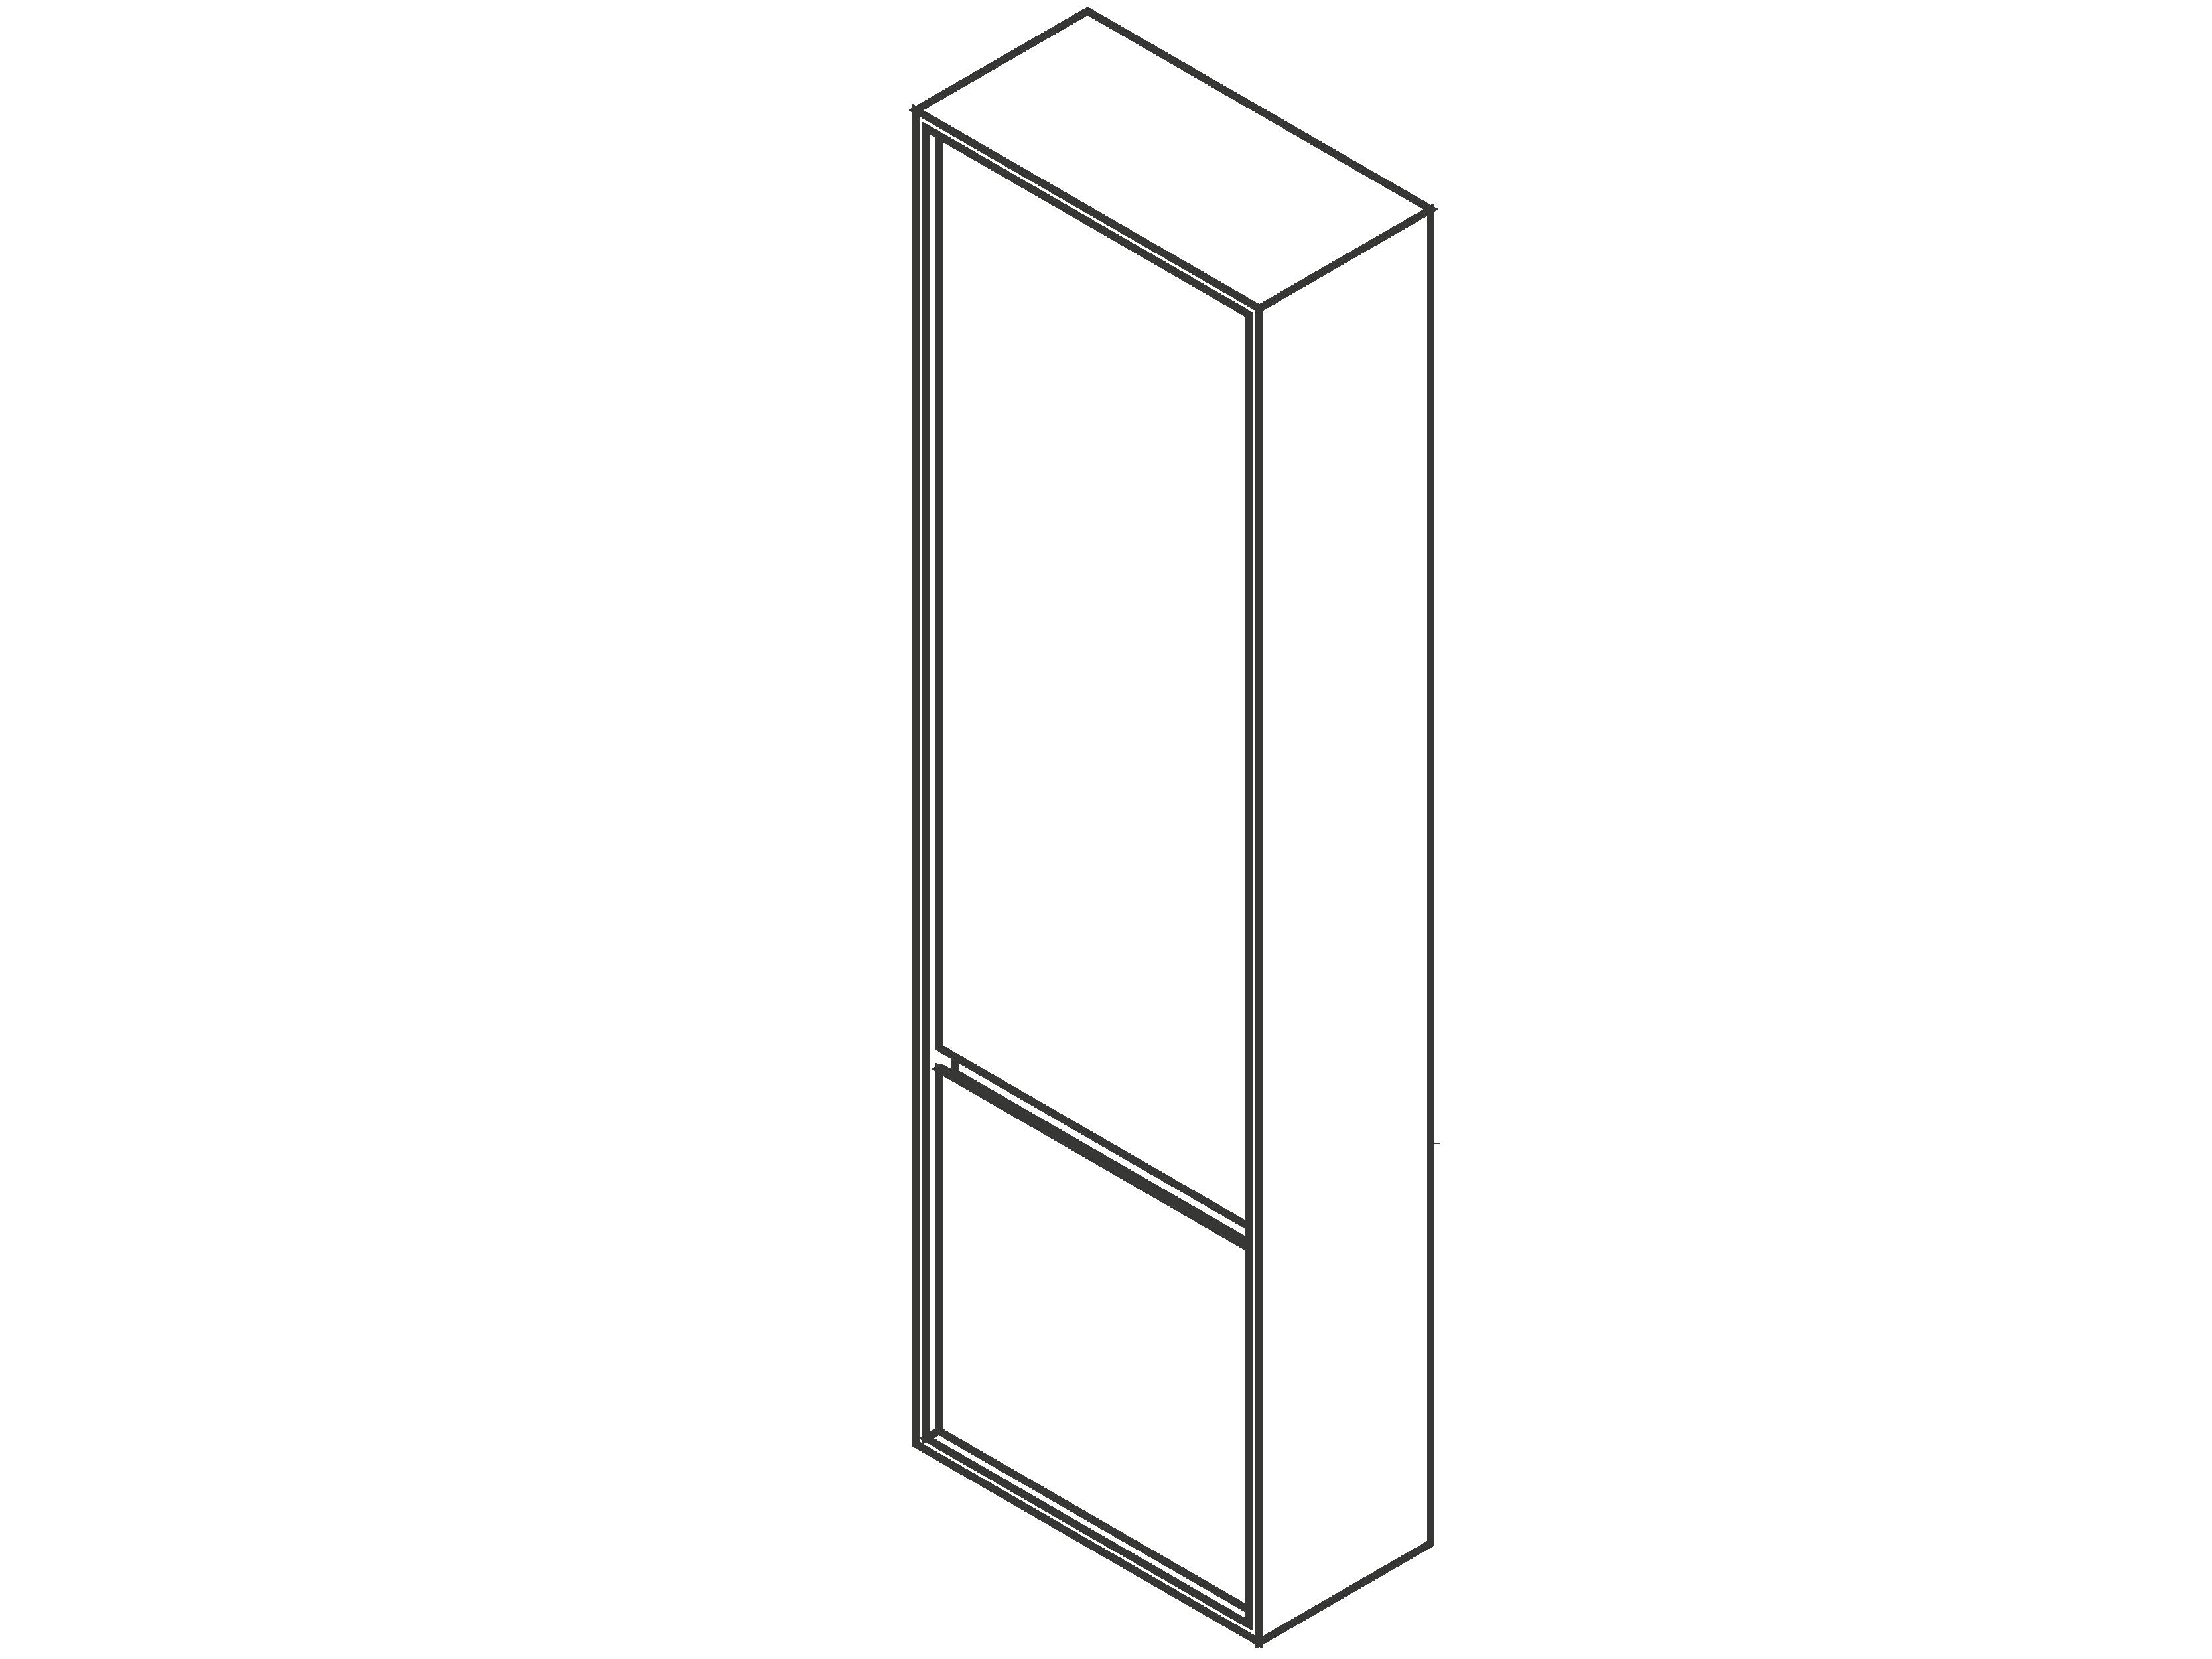 ARMOIRE BOX